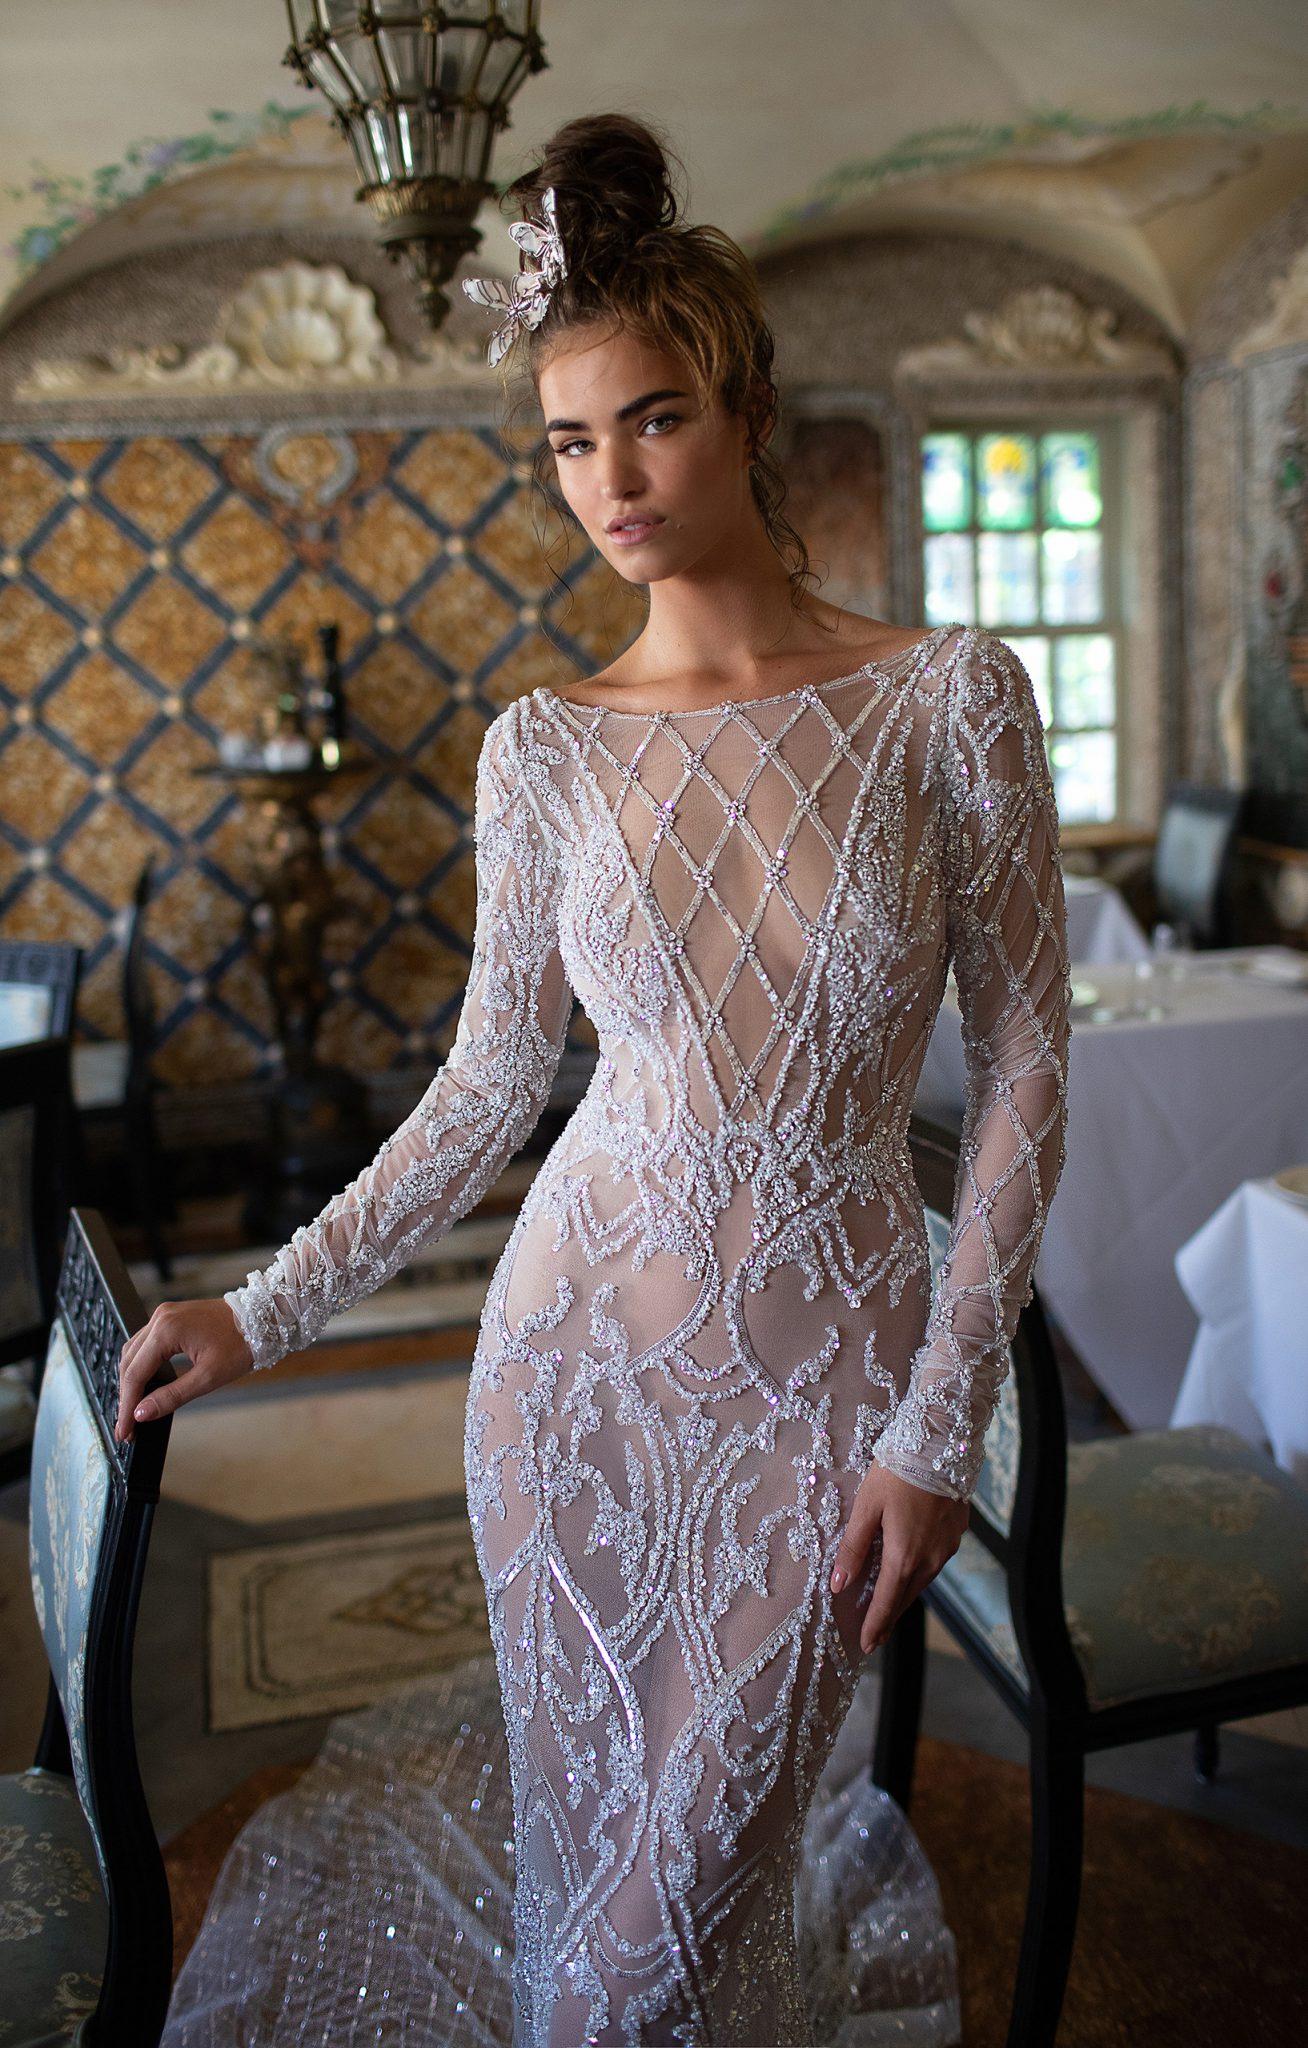 romantic wedding trends 2019 birdal dress kleid